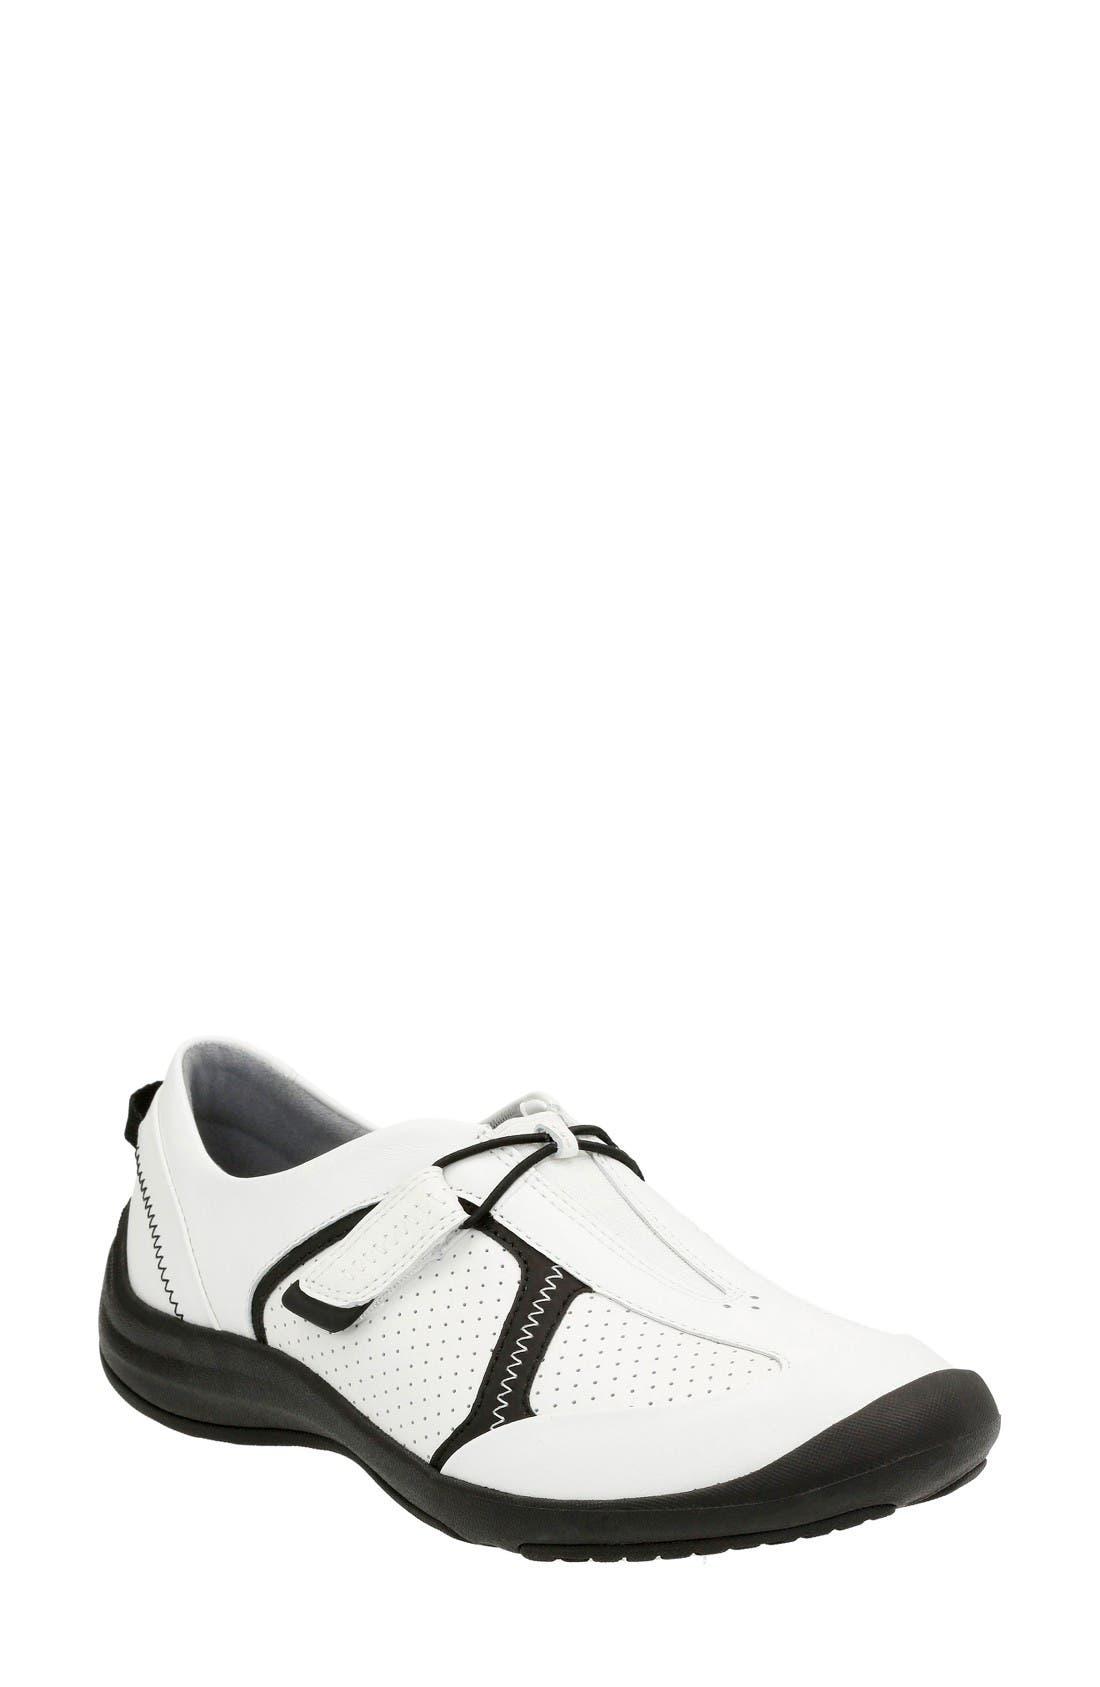 CLARKS® 'Asney' Slip-On Sneaker